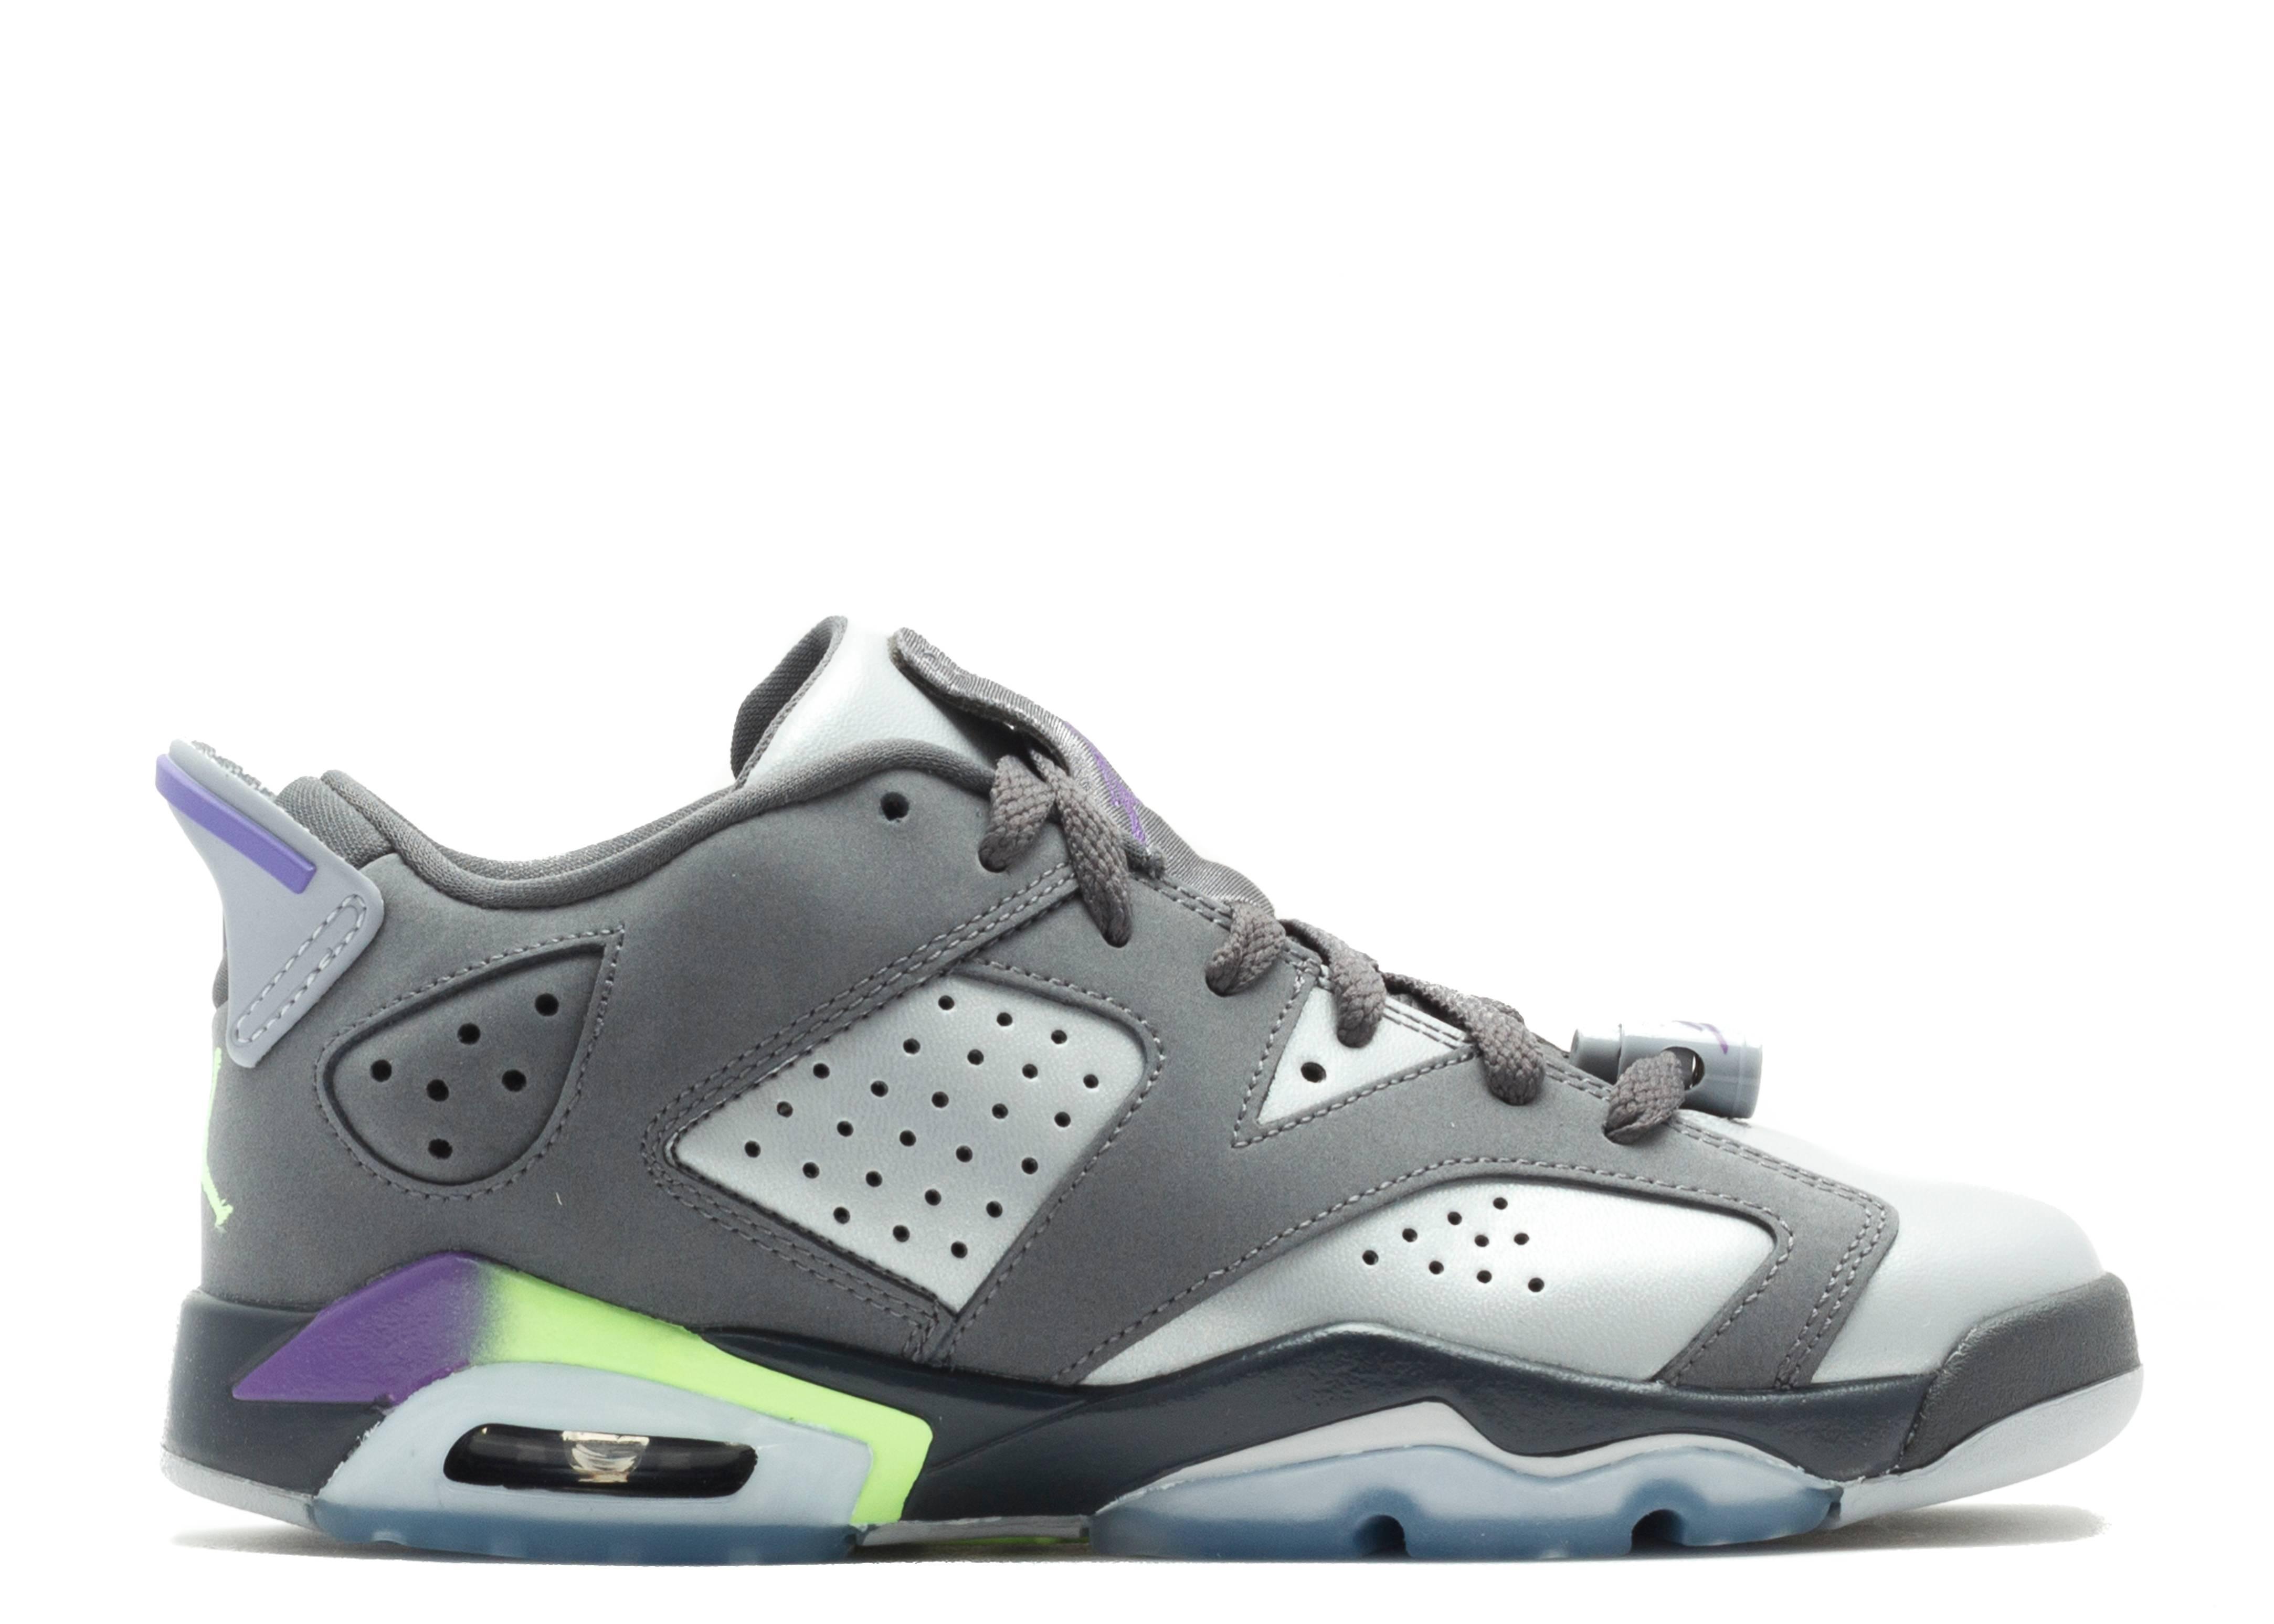 c9a1a401b43856 Air Jordan 6 Retro Low Gg (gs) - Air Jordan - 768878 008 - drk gry ...